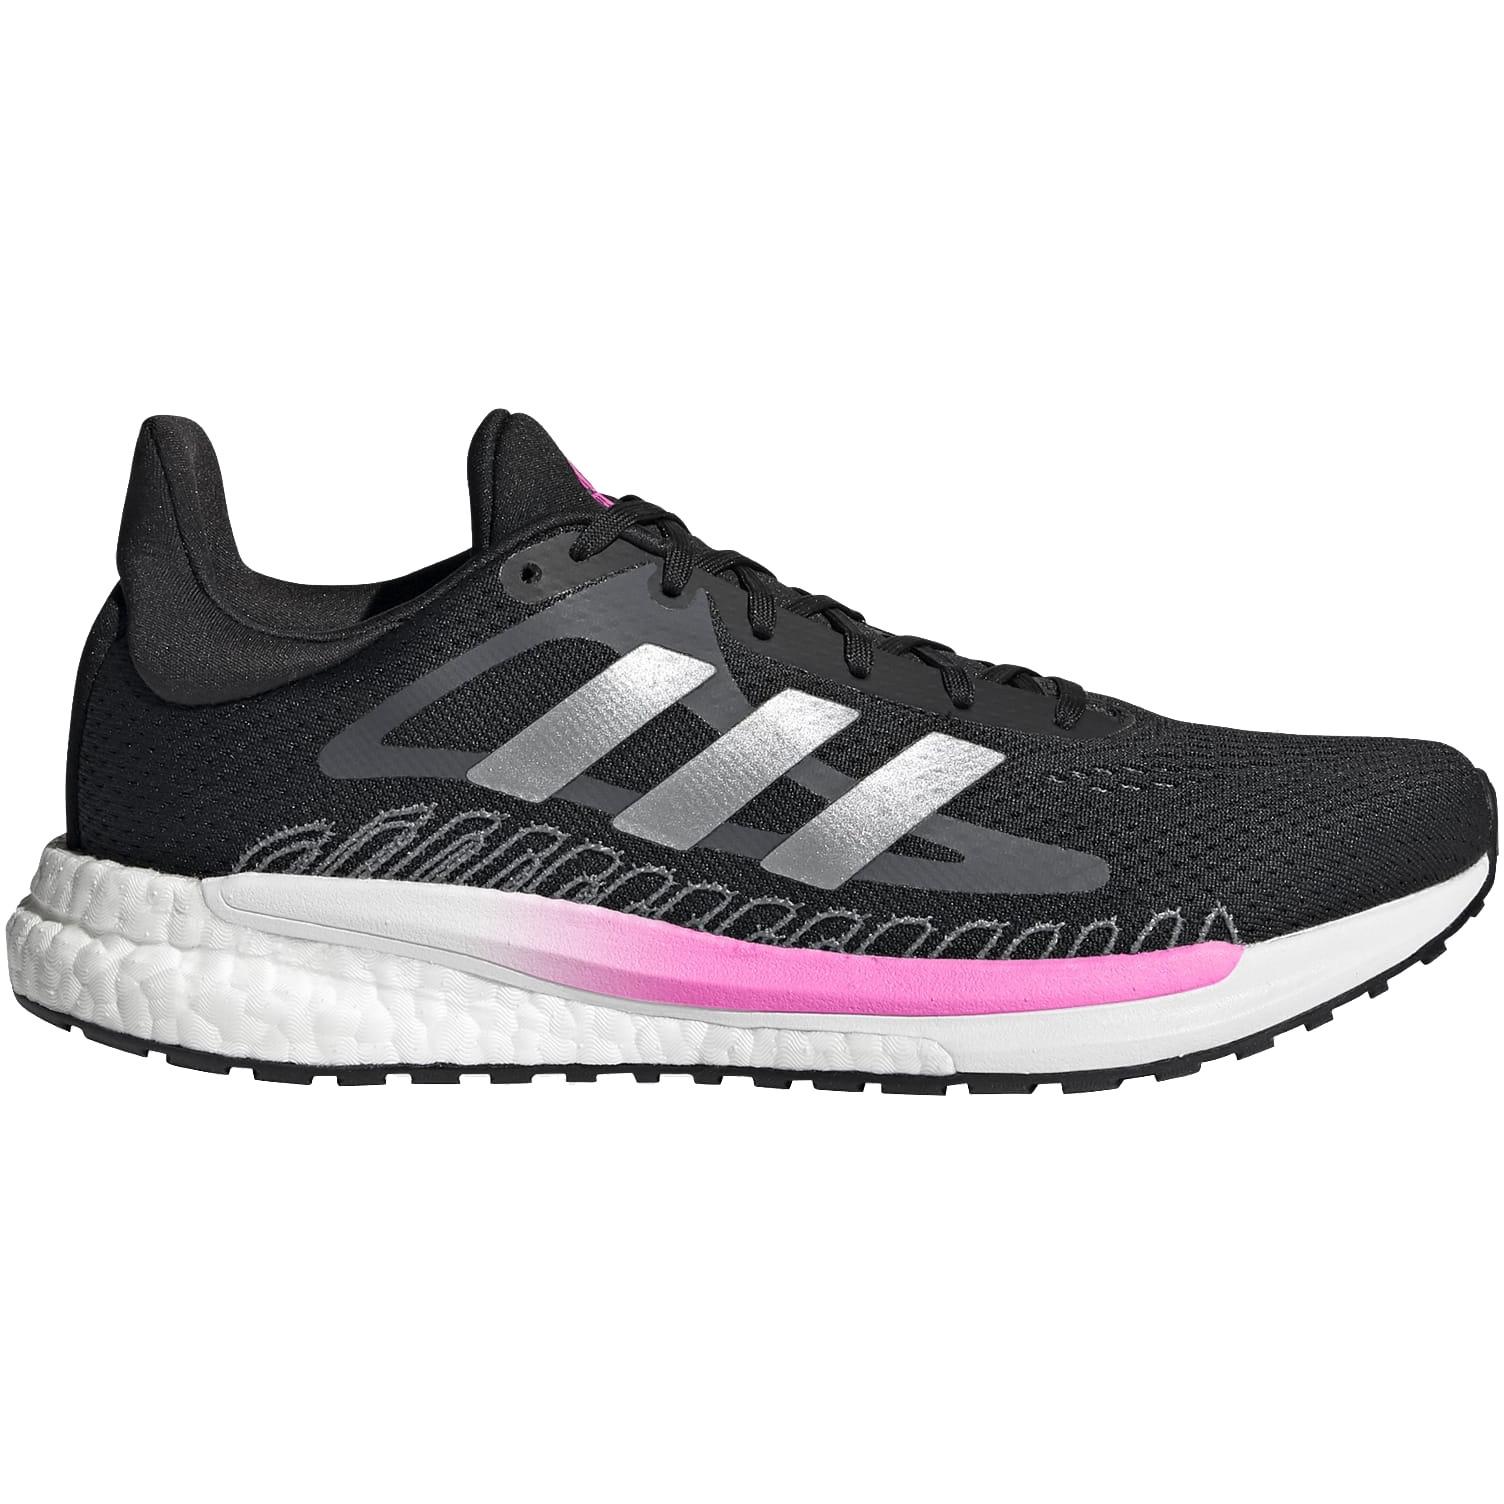 adidas Women's SolarGlide Running Shoes - core black/silver metallic/screaming pink GZ8824